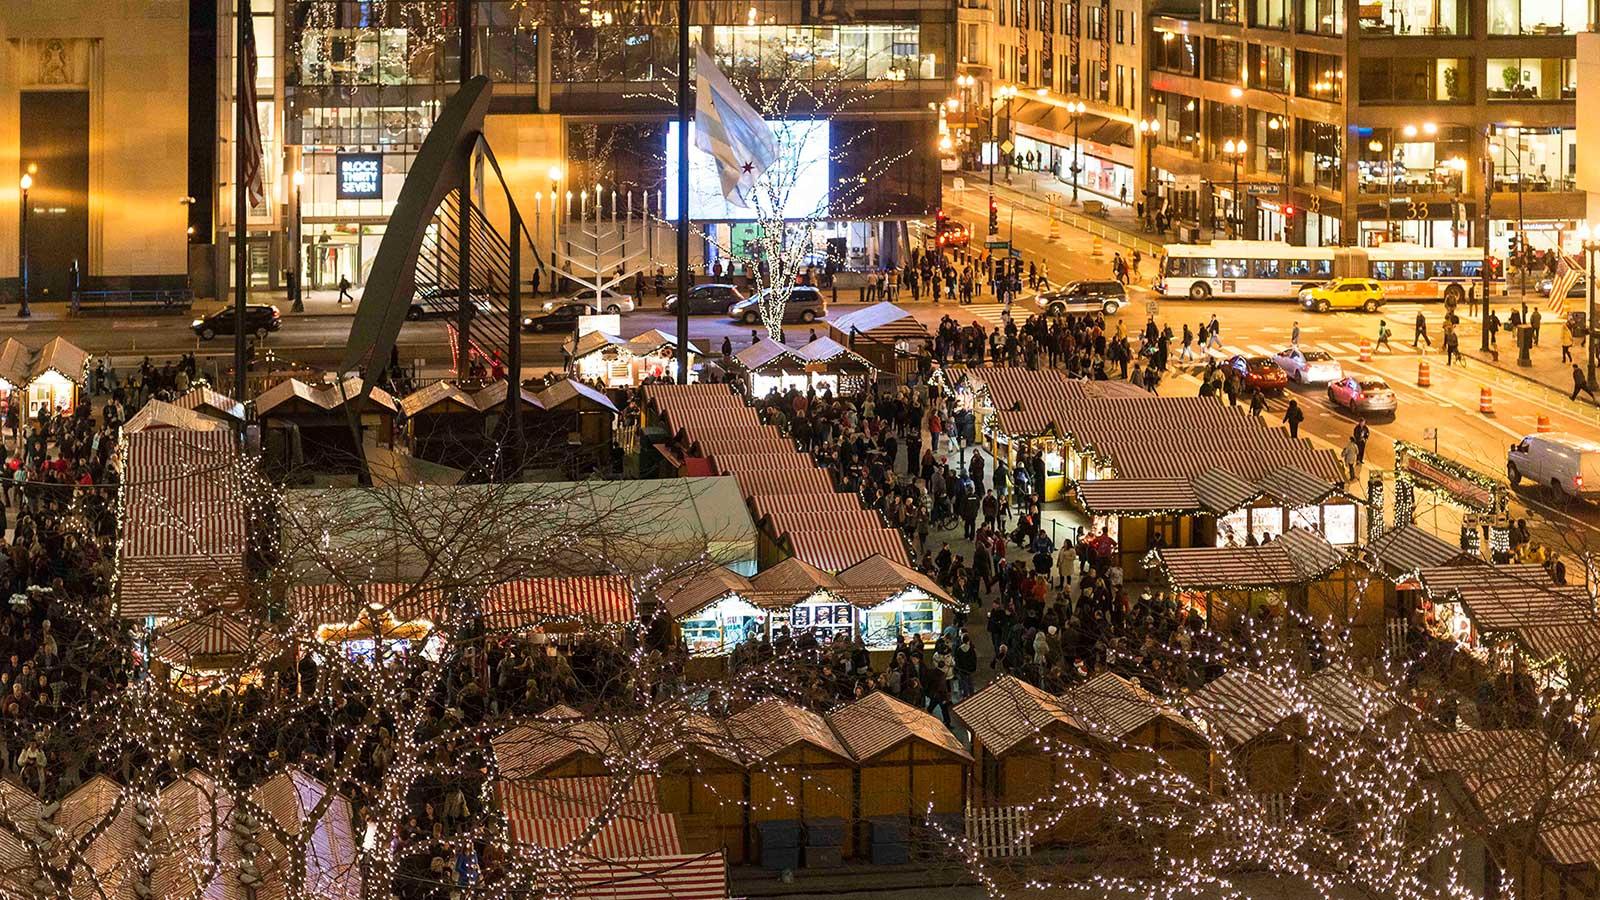 Christmas Market Chicago 2021 Christkindlmarket Holiday Market 2021 Chicago